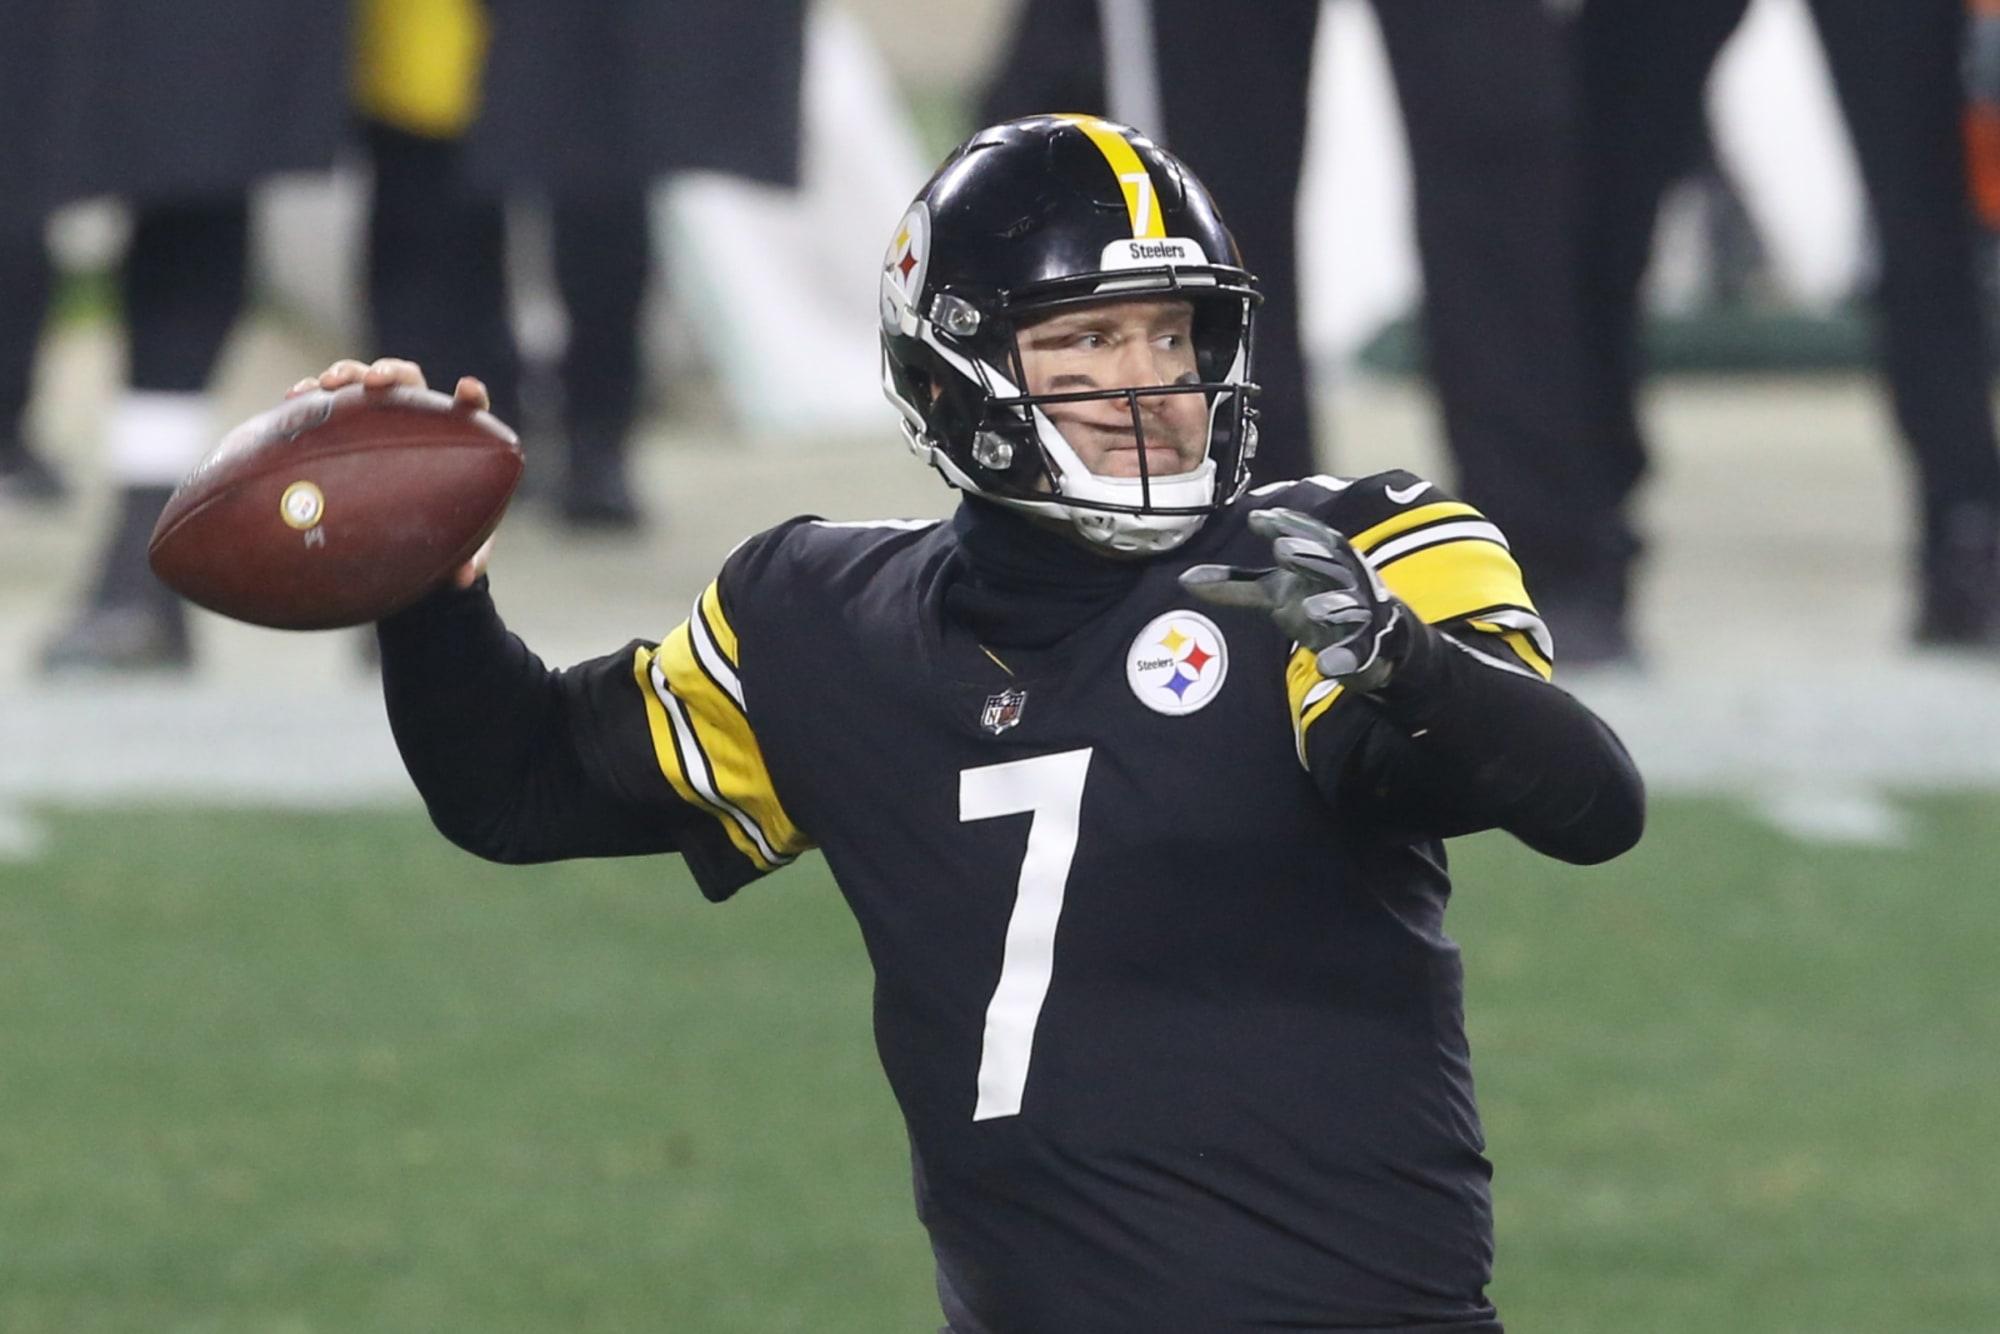 NFL Draft: 3 dark horse quarterbacks Steelers should take to succeed Ben Roethlisberger